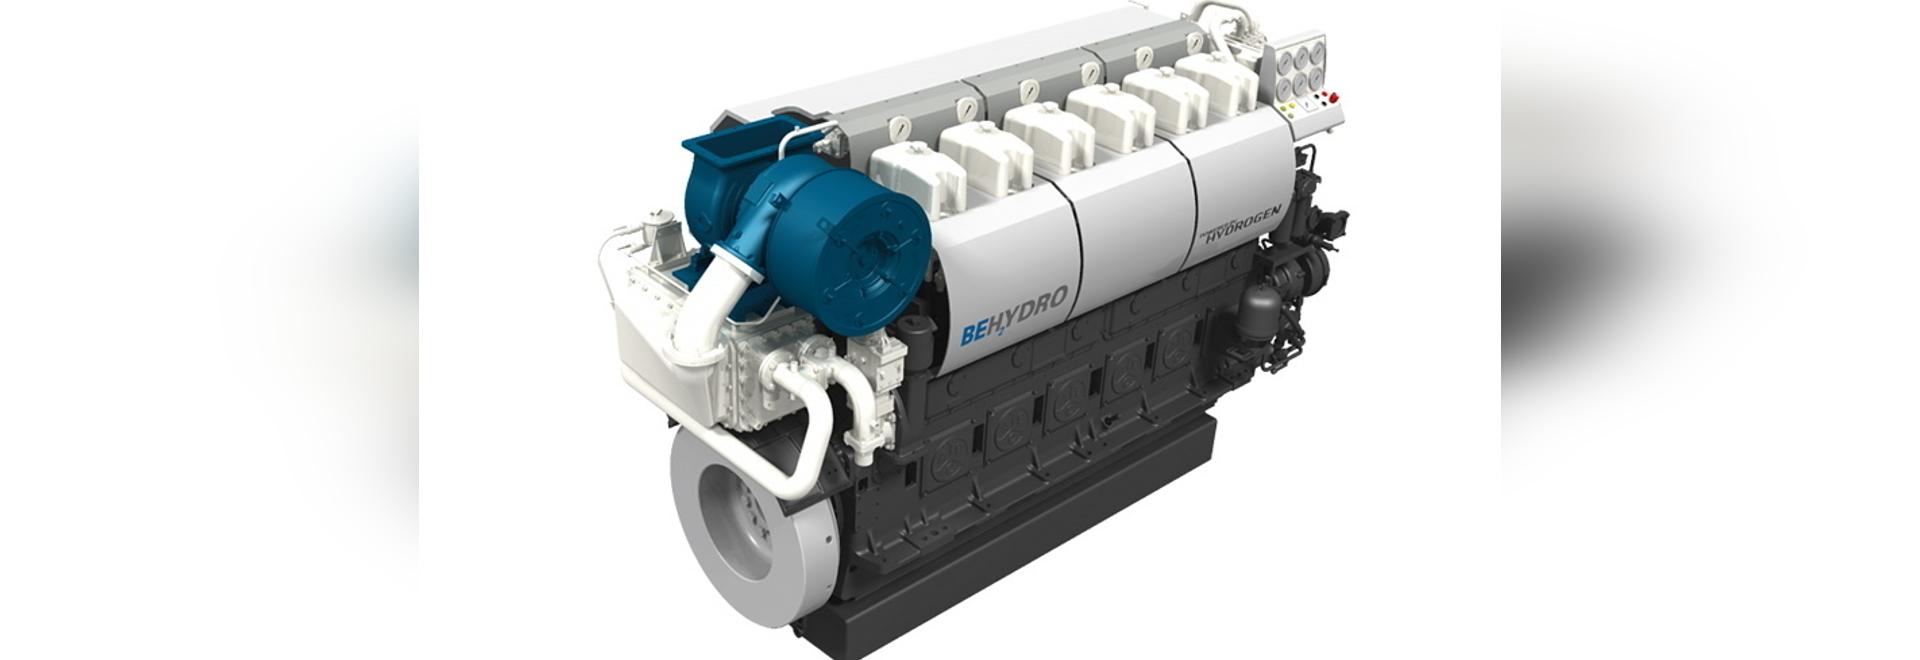 BeHydro engine